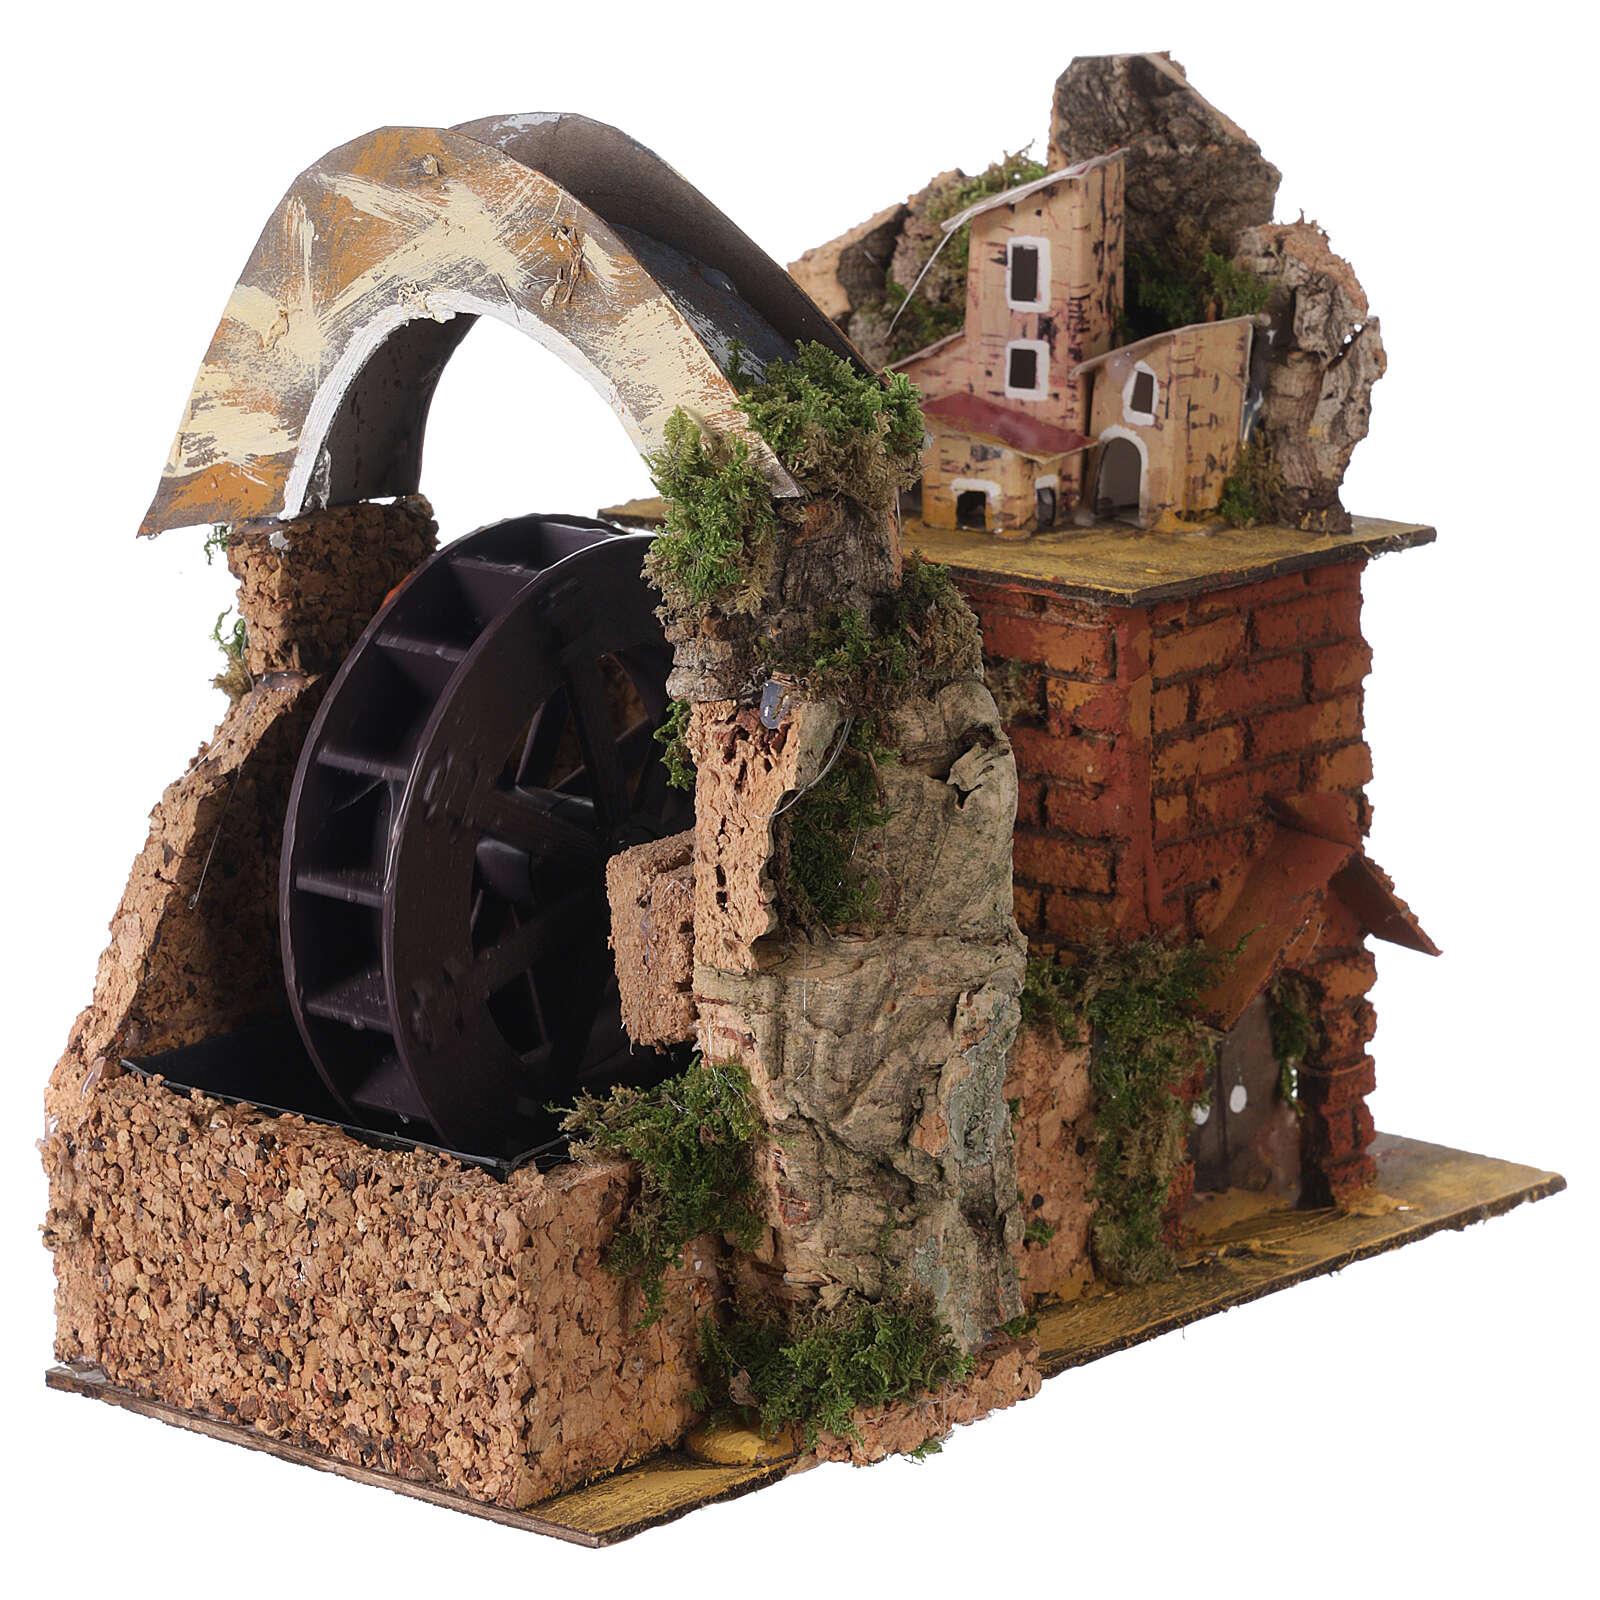 Watermill with bridge for Neapolitan Nativity Scene 20x15x20 cm 4